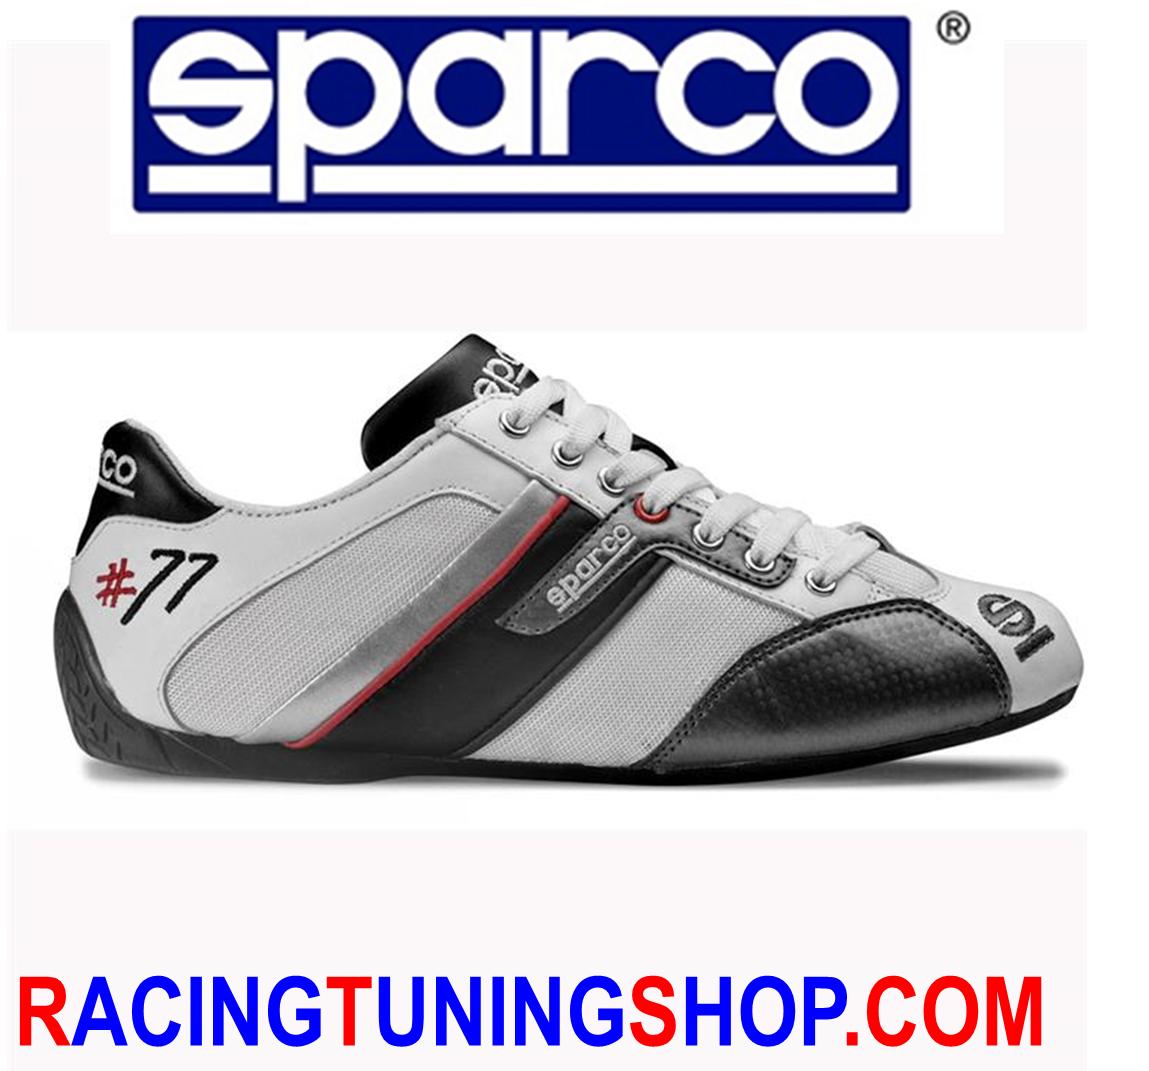 schuhe SPARCO Weiß TIME 77 TG 41 Weiß SPARCO Schuhe SNEAKERS SPARCO SCHUHE TEAMWEAR SIZE 41 8b7121